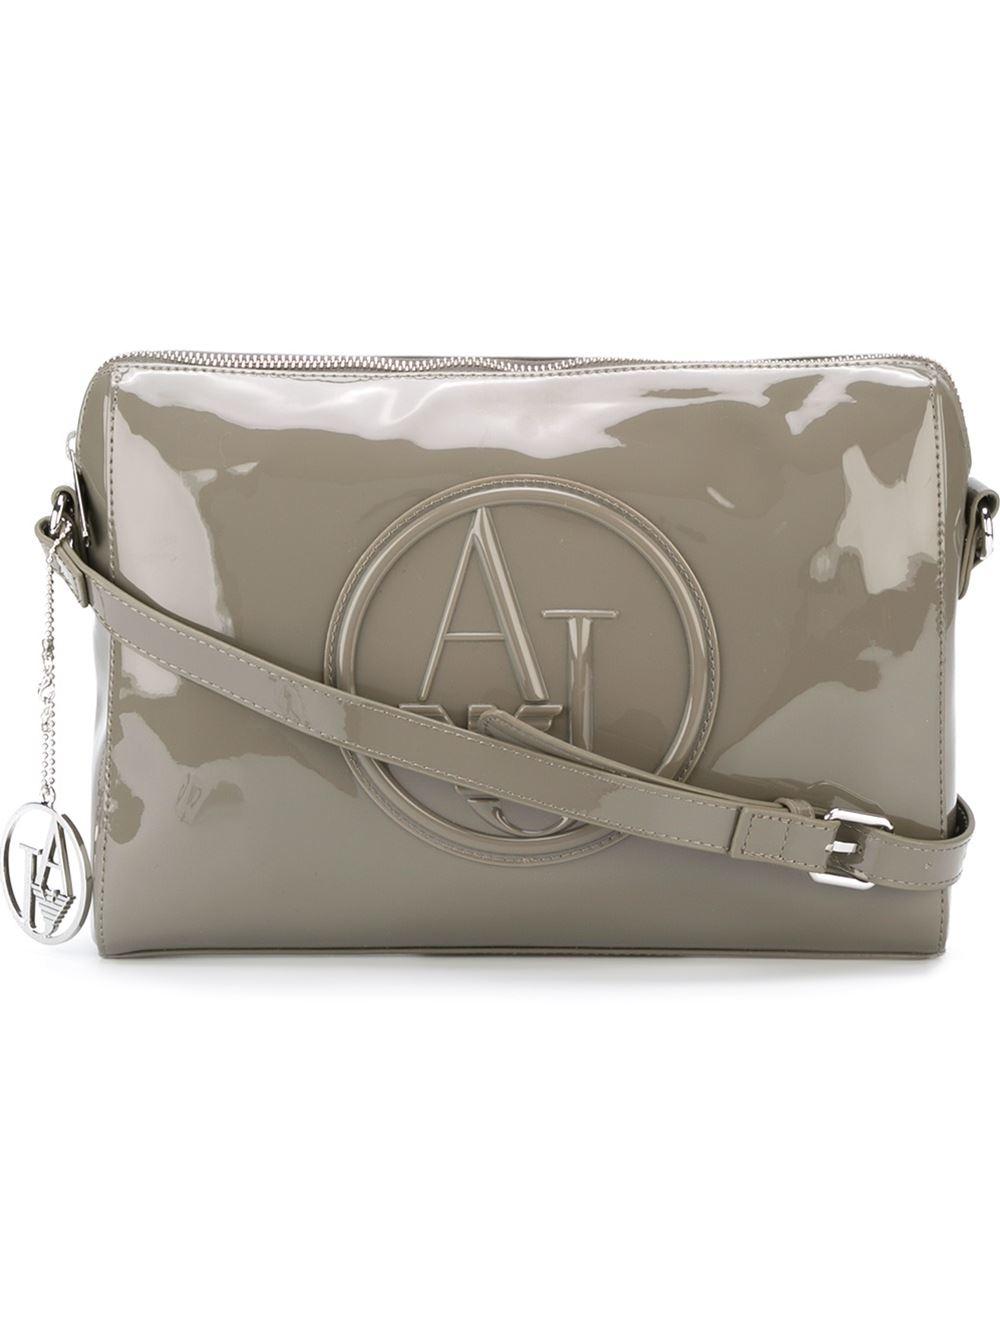 a4799b2c8c1f Armani Jeans Embossed Logo Cross Body Bag in Brown - Lyst